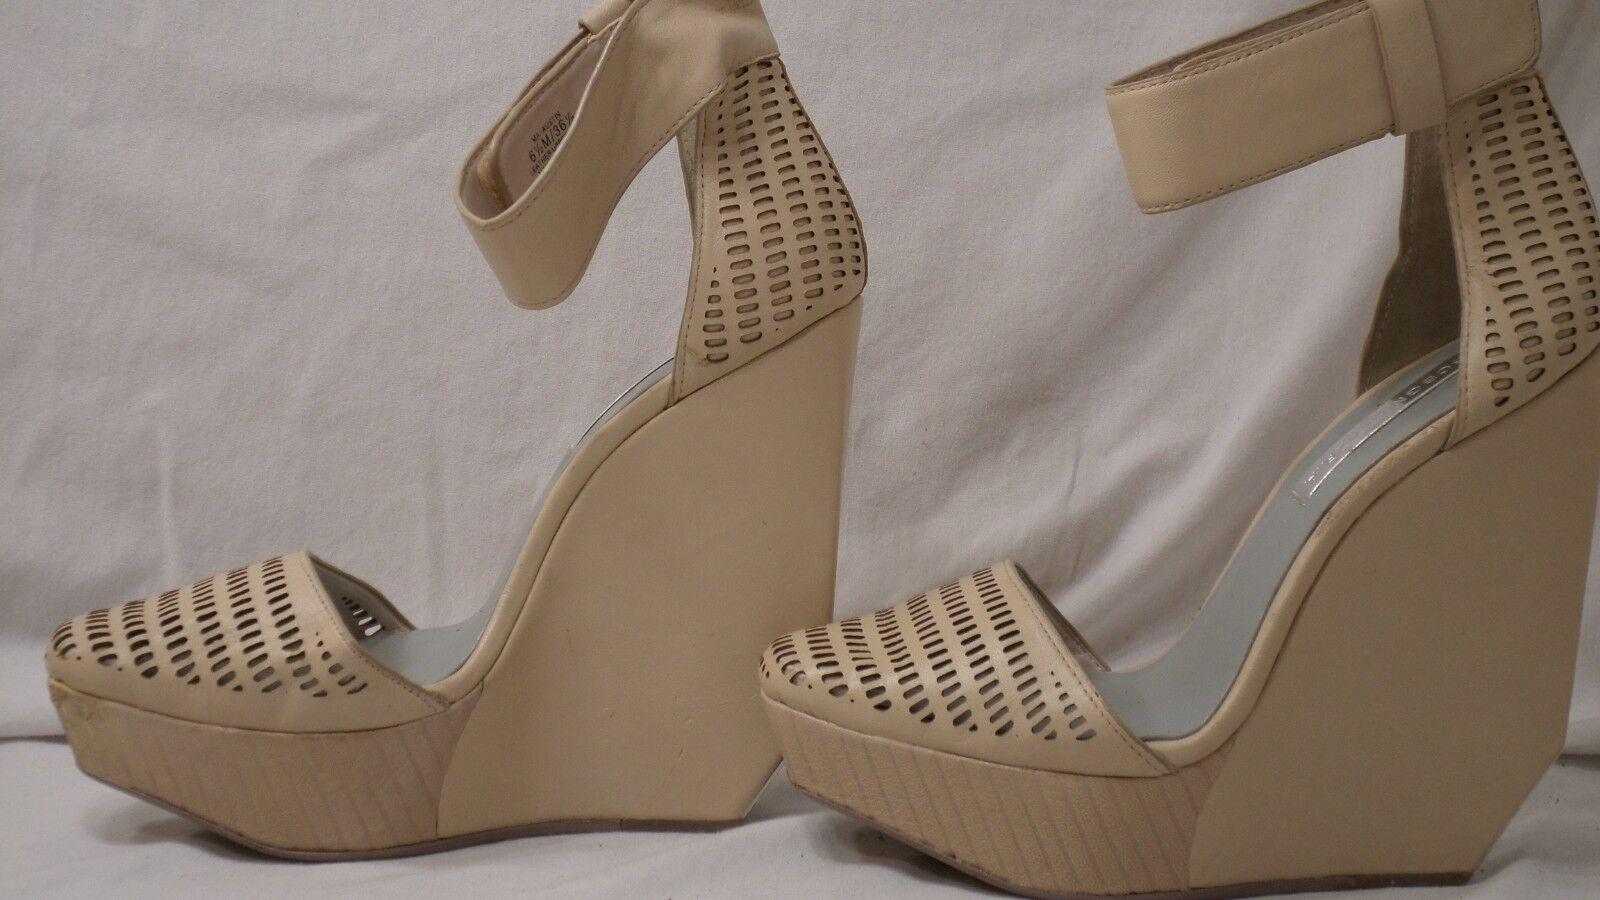 economico e alla moda BCBGMAXAZARIA 'Austin Day' Platform Platform Platform Parfait Leather Wedge Sandal donna Dimensione 6.5  elementi di novità